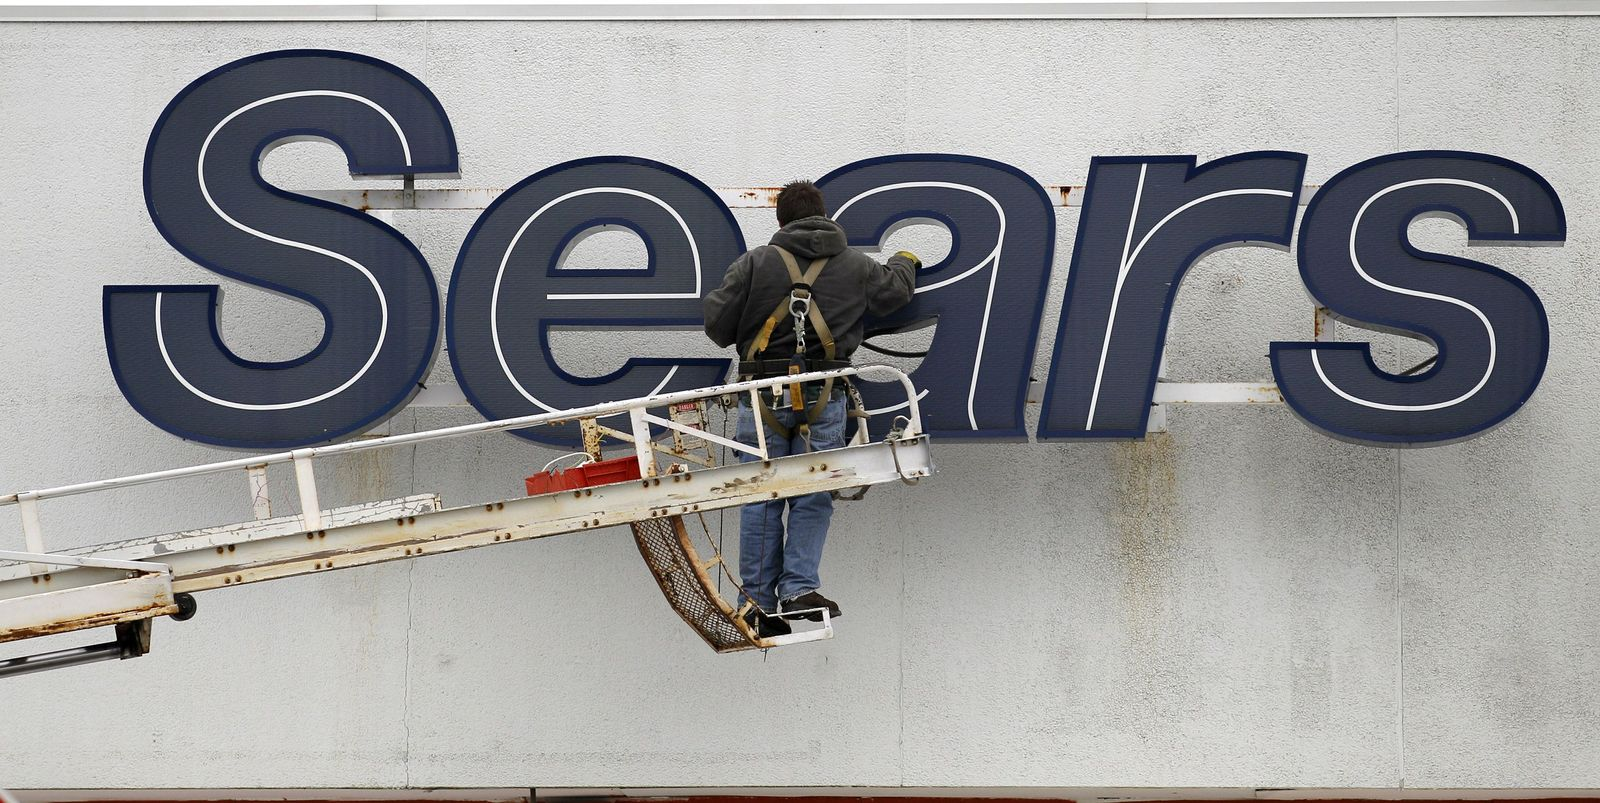 US-Handelshaus Sears